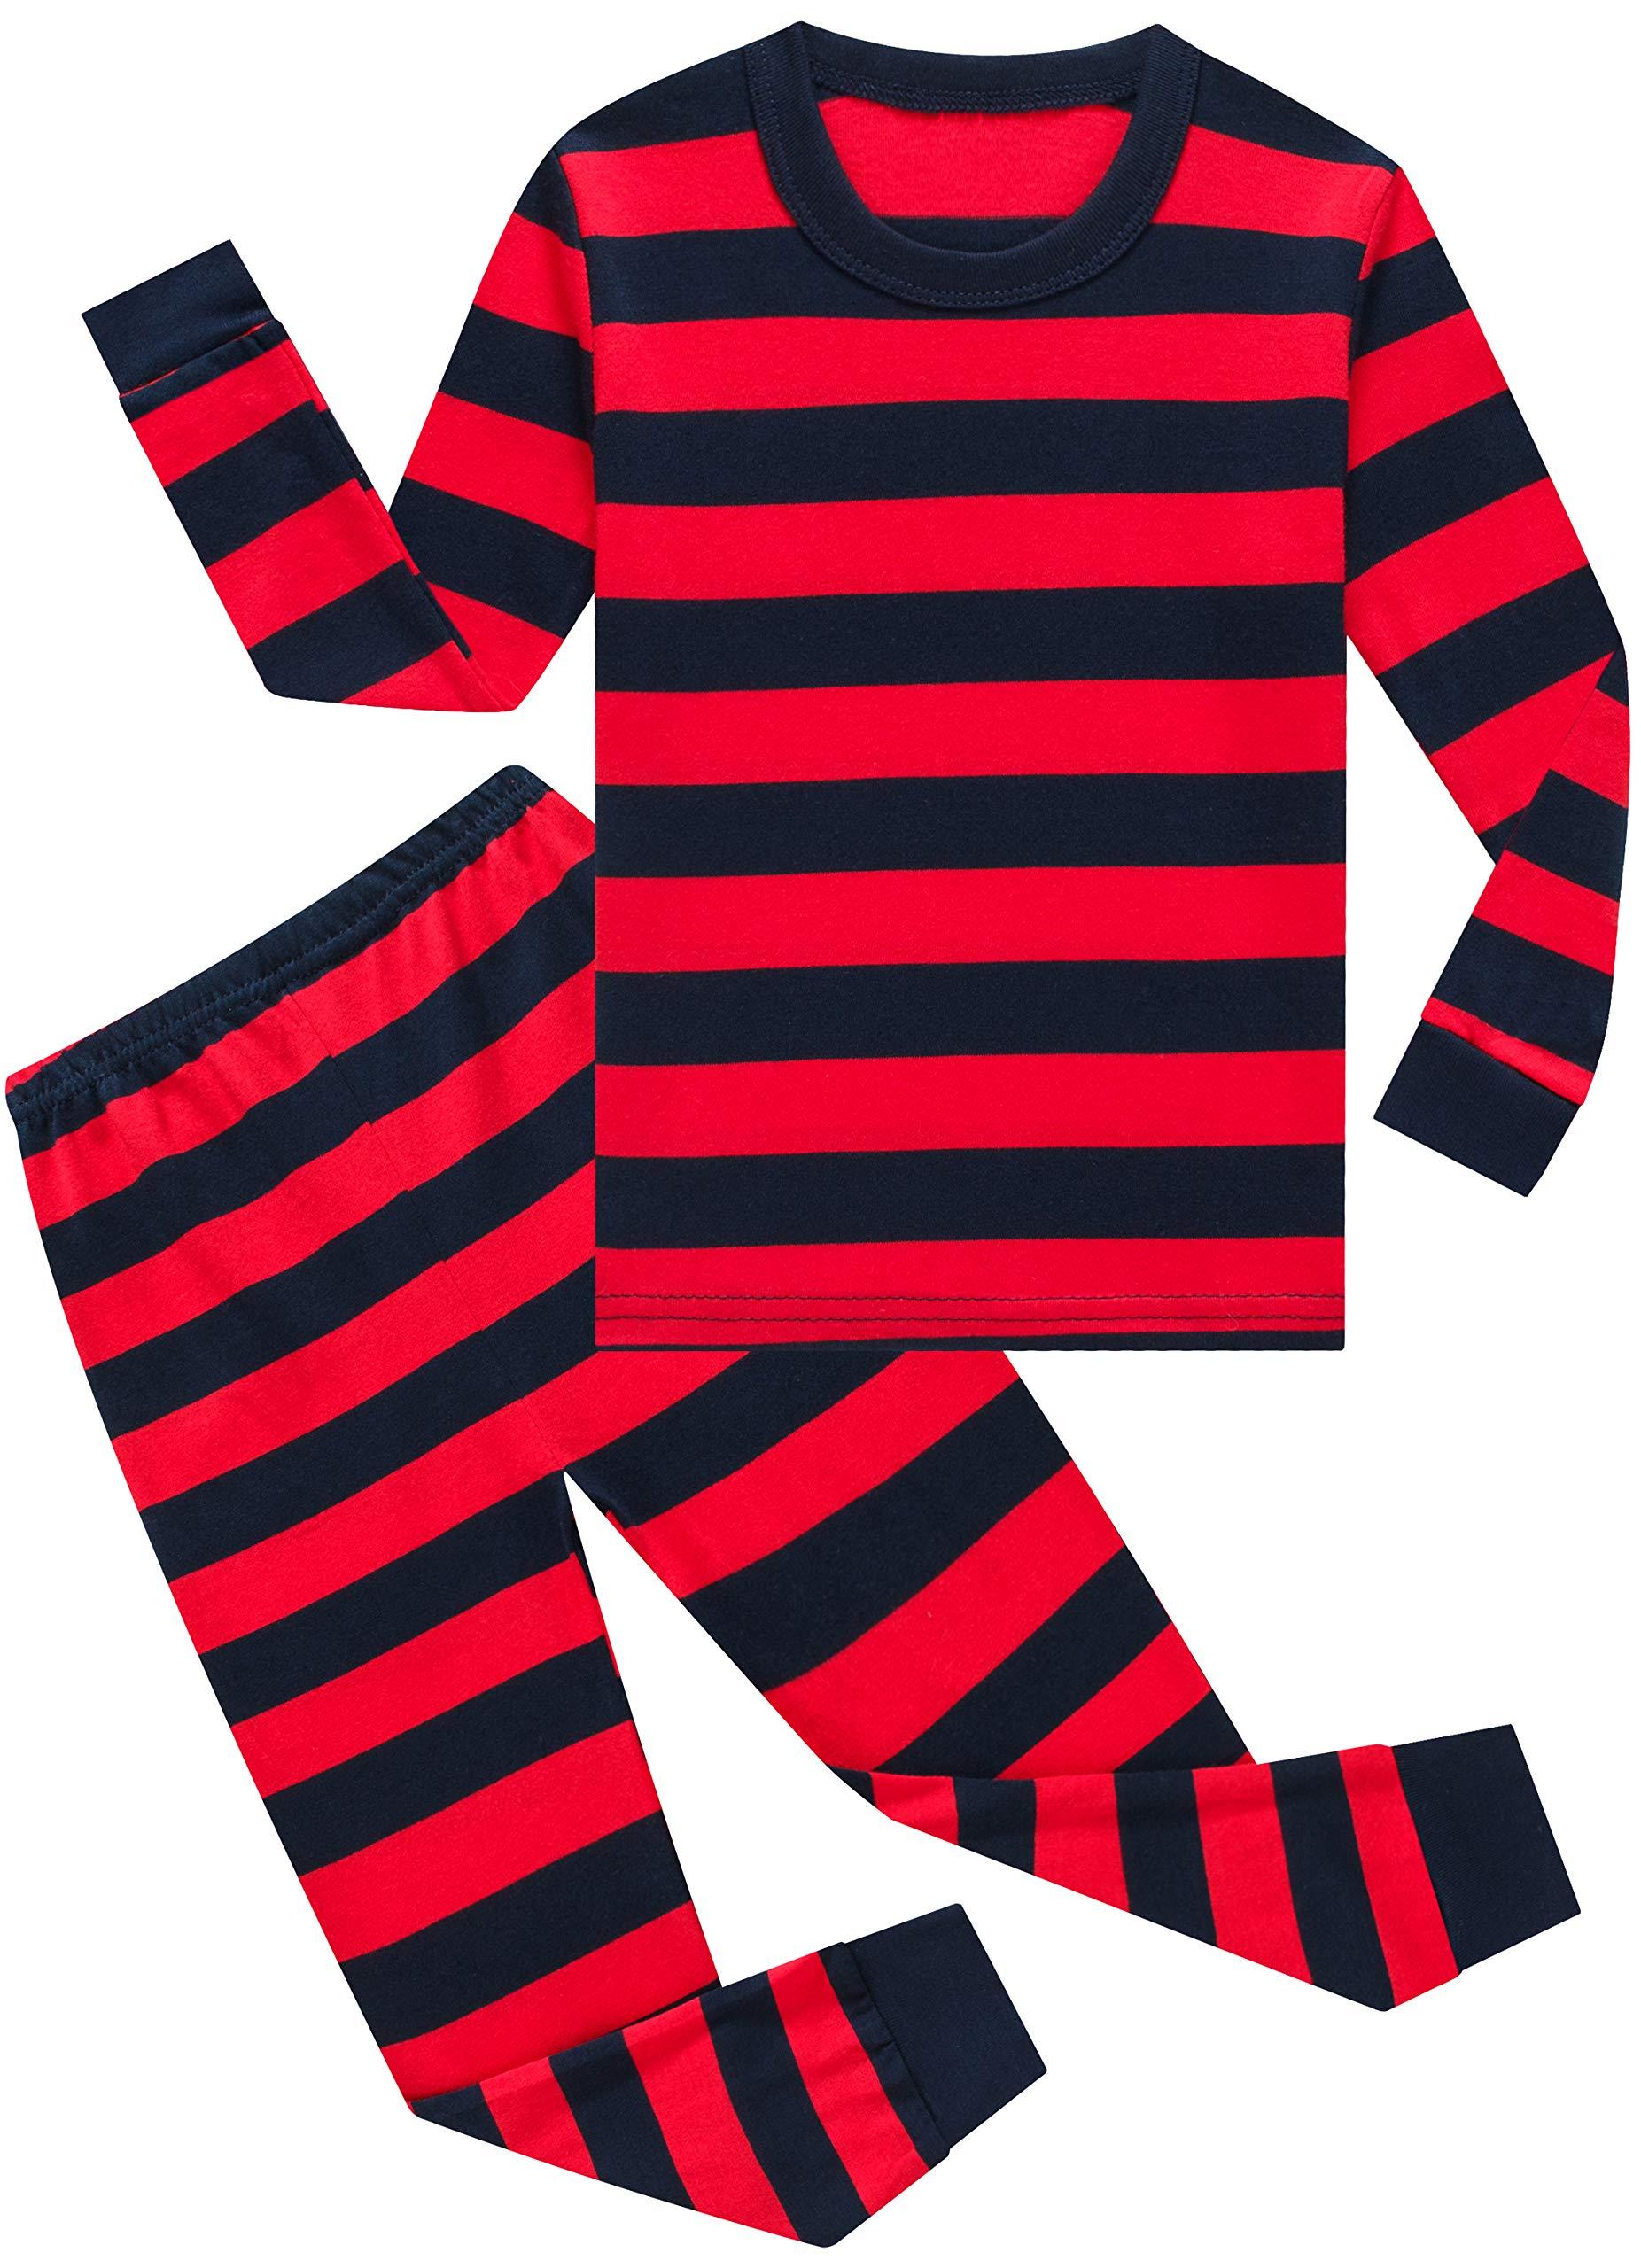 Little Boys Girls Cotton Pajamas Children Striped PJS Gift Set Kids Sleepwear Clothes